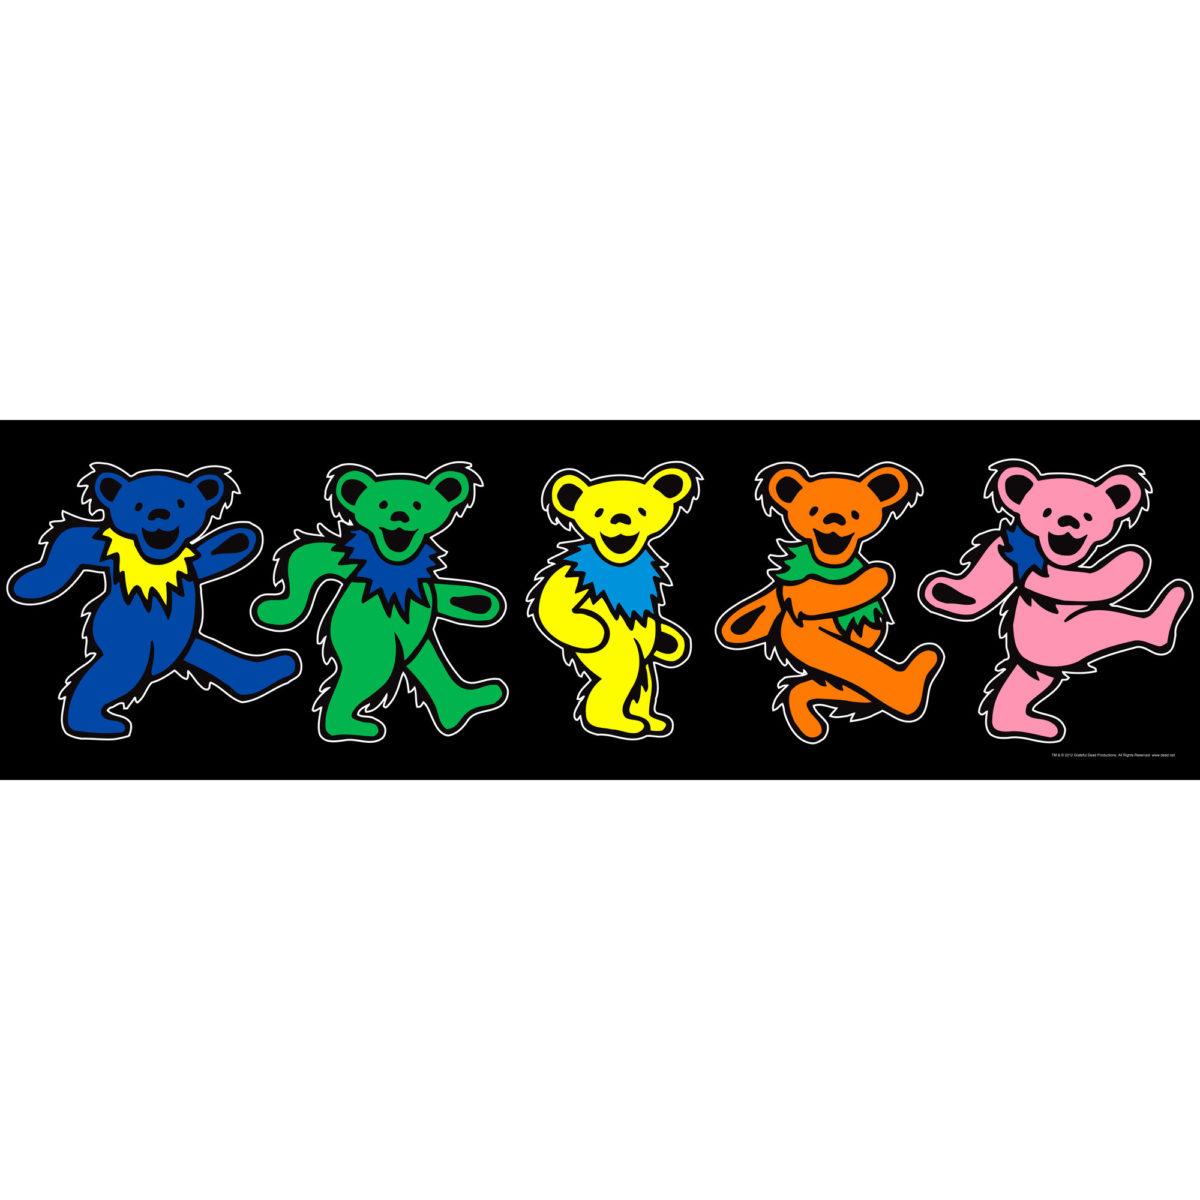 Description: The colorful, classic Grateful Dead dancing bears come to .